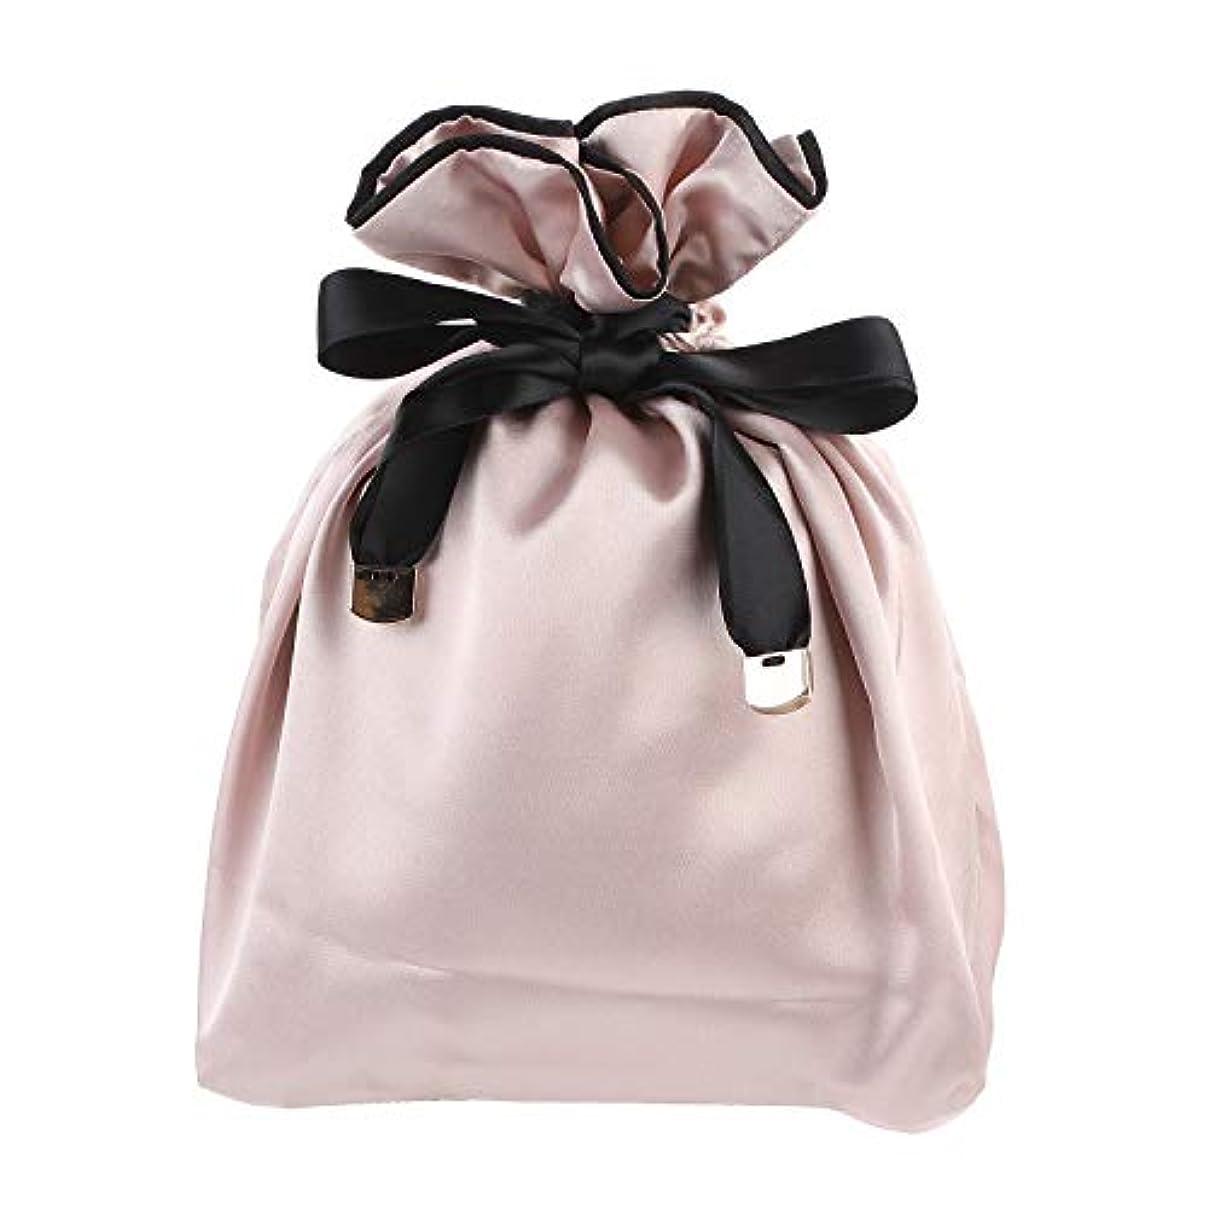 NEOVIVA 巾着 袋 女の子 化粧品ポーチ 小物入れ スベスベ 旅行 ギフト ピンク 巾着袋だけ